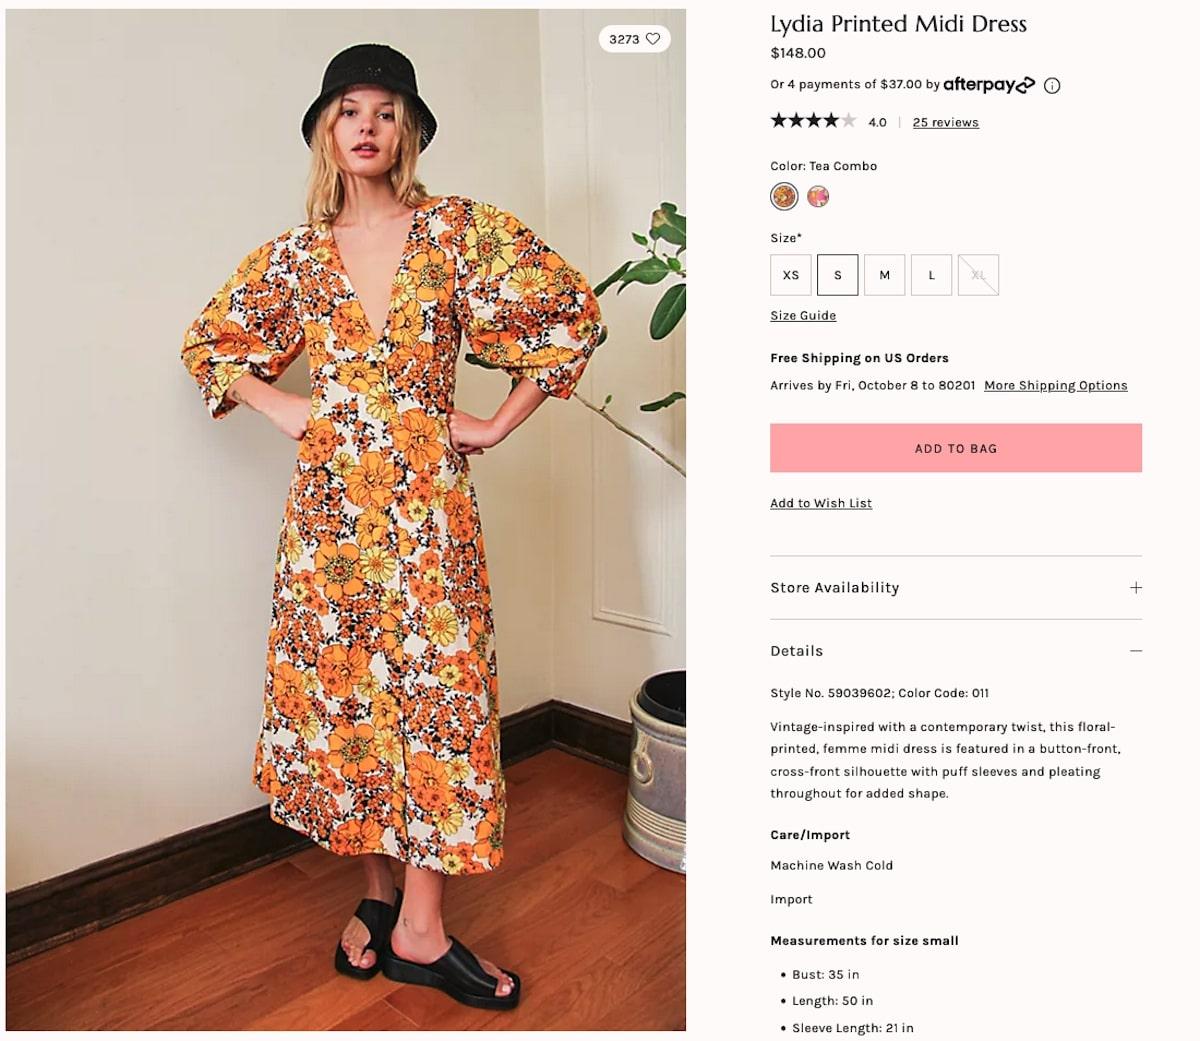 Bachelorette party outfits:  Lydia Printed Midi Dress